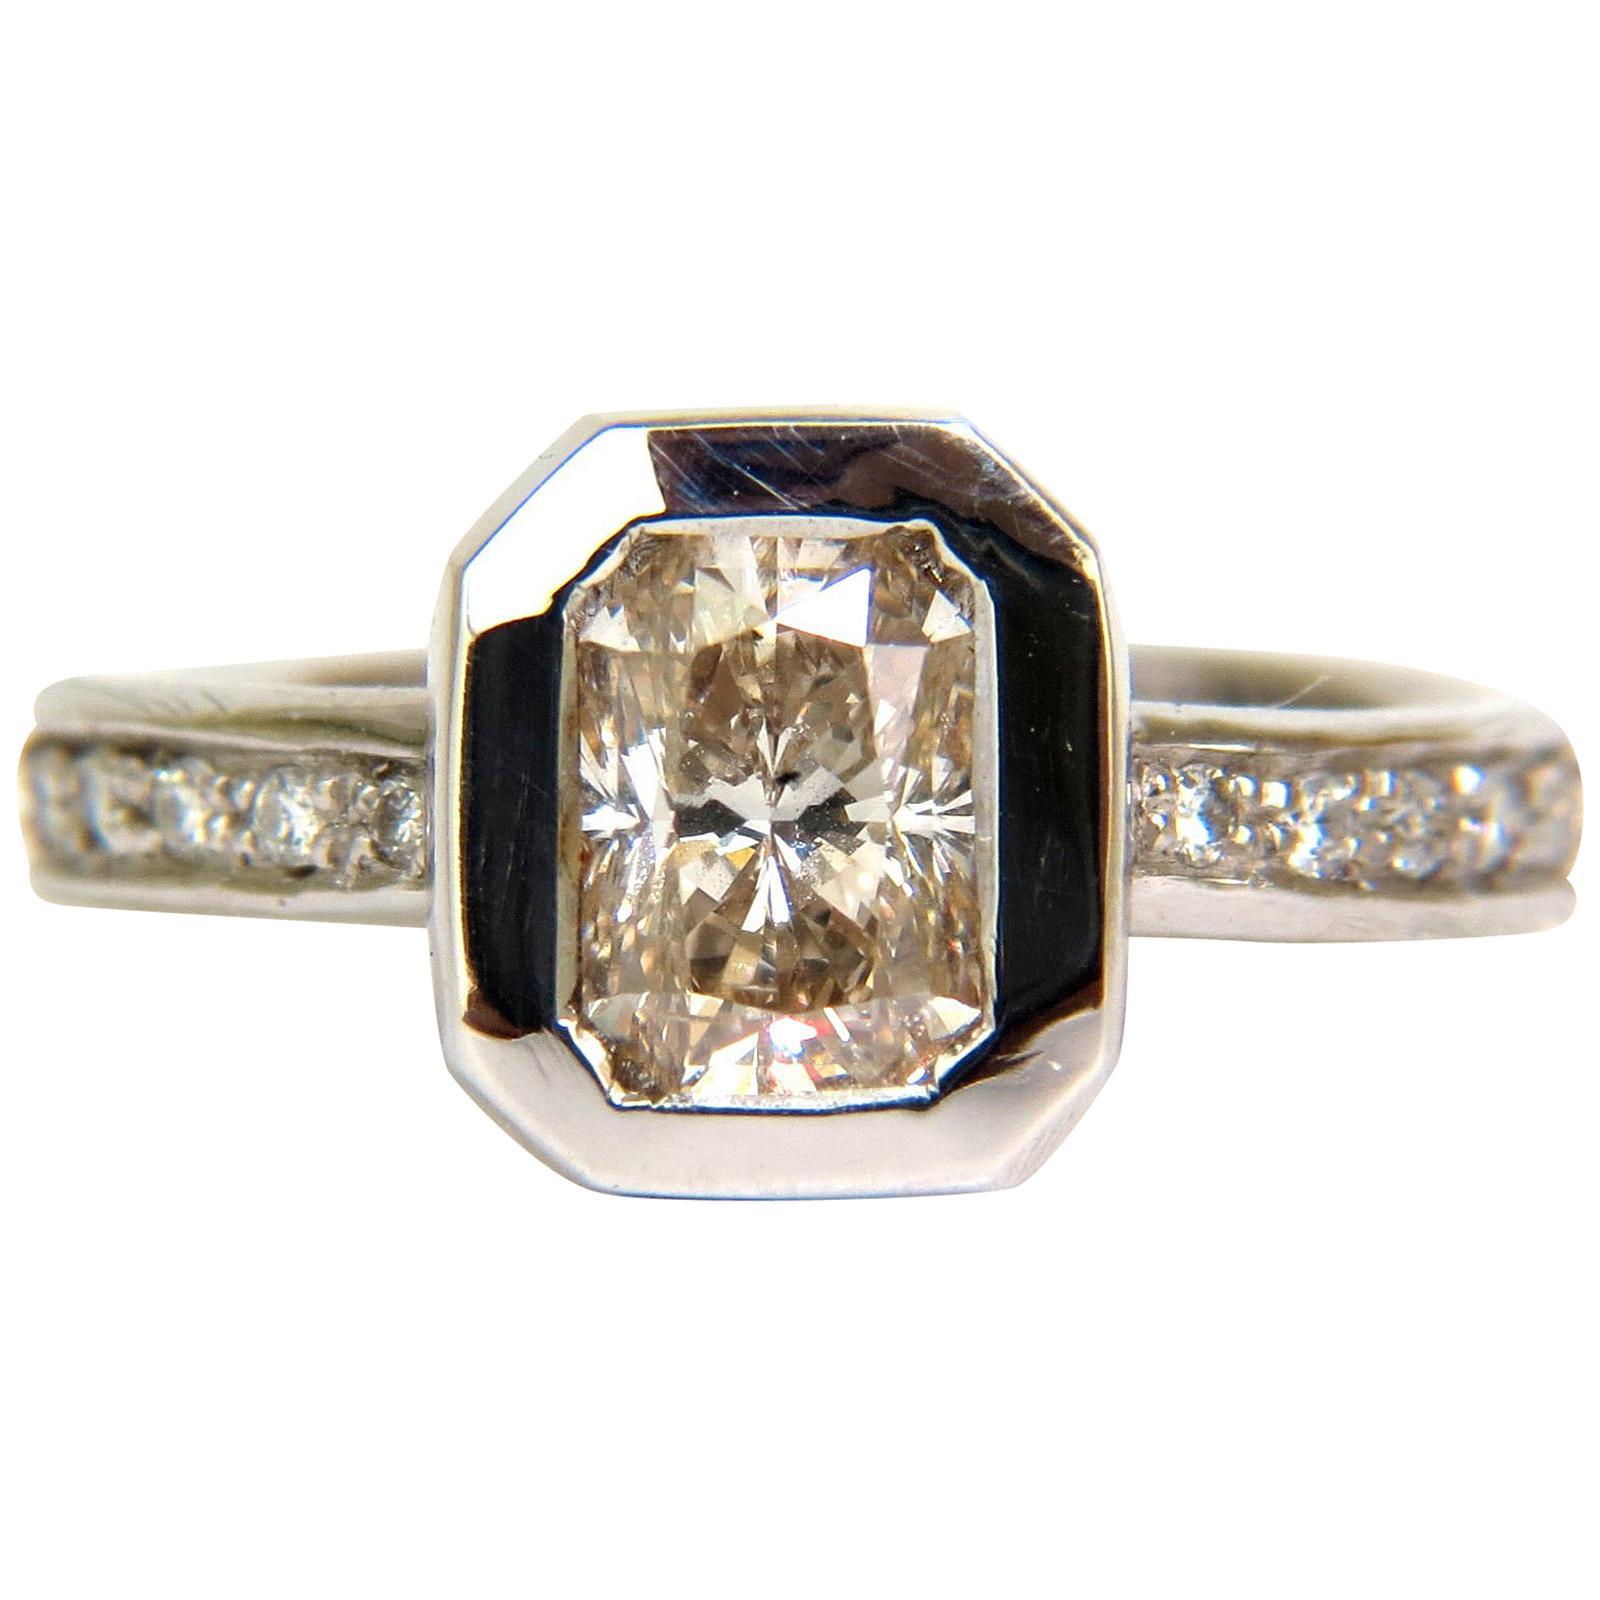 1.52 Carat Fancy Natural Brown Color Diamond Eternity Ring 14 Karat